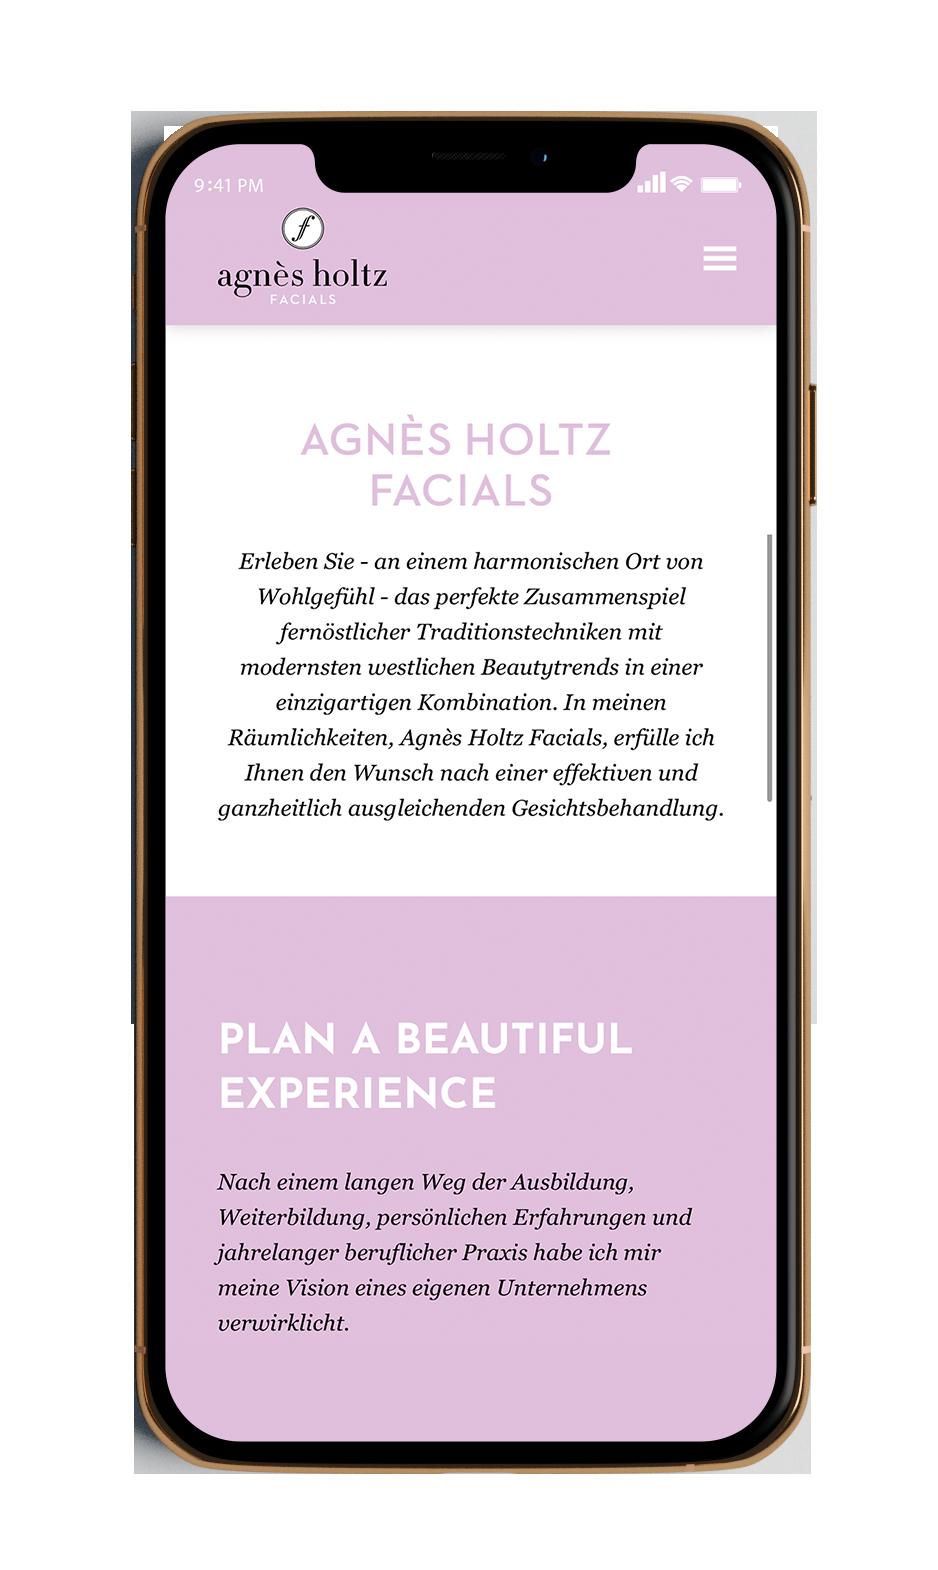 Agnès Holtz Facials Hamburg, Kosmetikstudio in Hamburg, Harvestehude, Fazits, Treatments, Skin, Kosmetik, Kosmetikprodukte, Hochallee 60